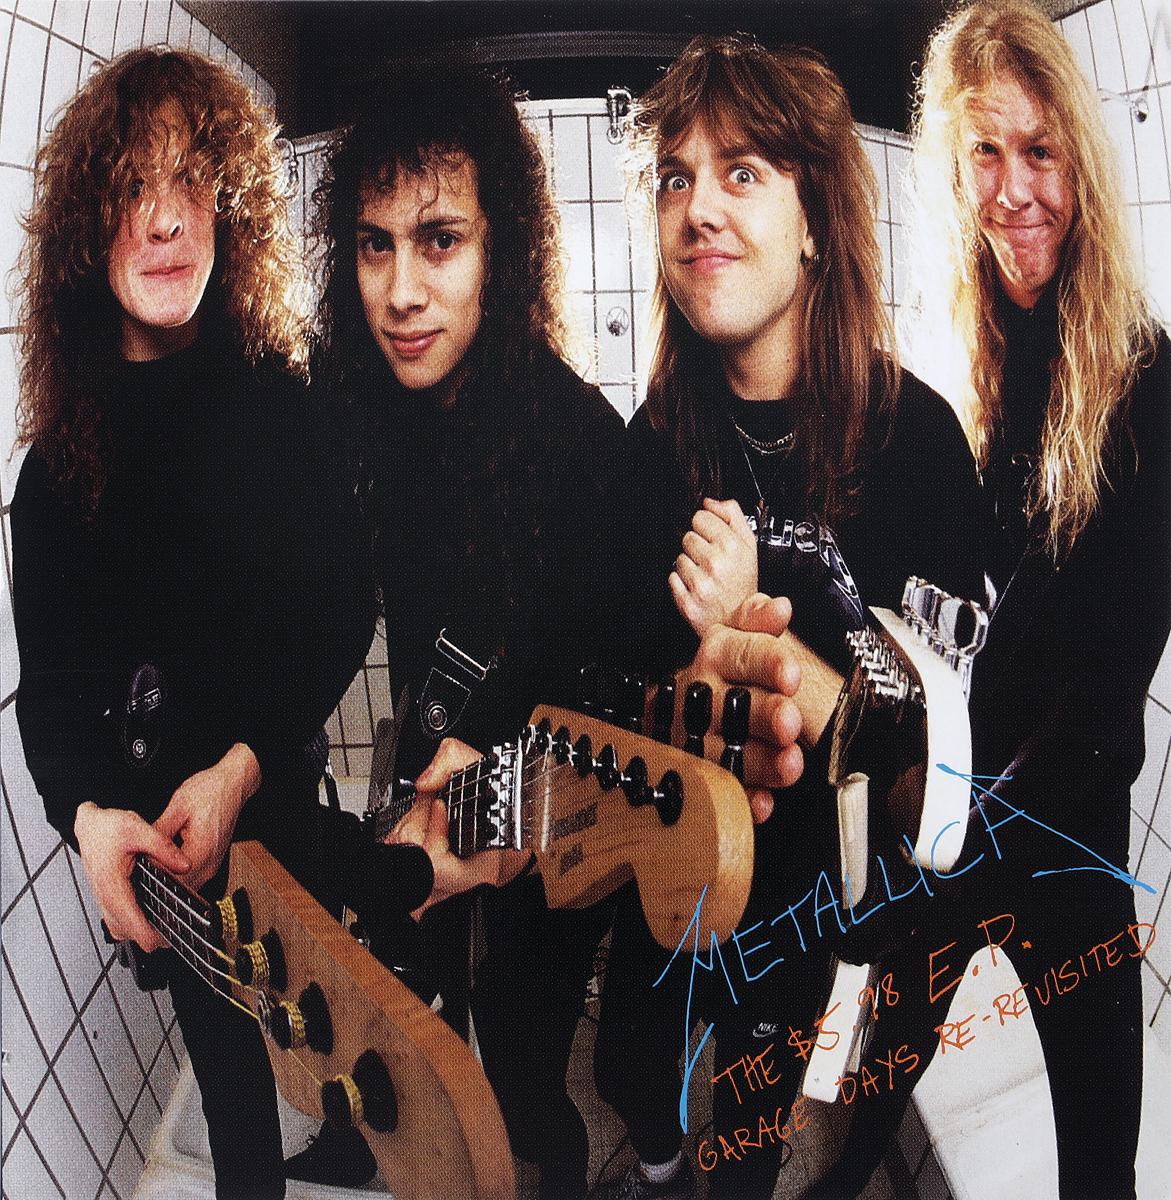 Metallica Metallica. The $5.98 E.P Garage Days Re-Revisited metallica garage inc